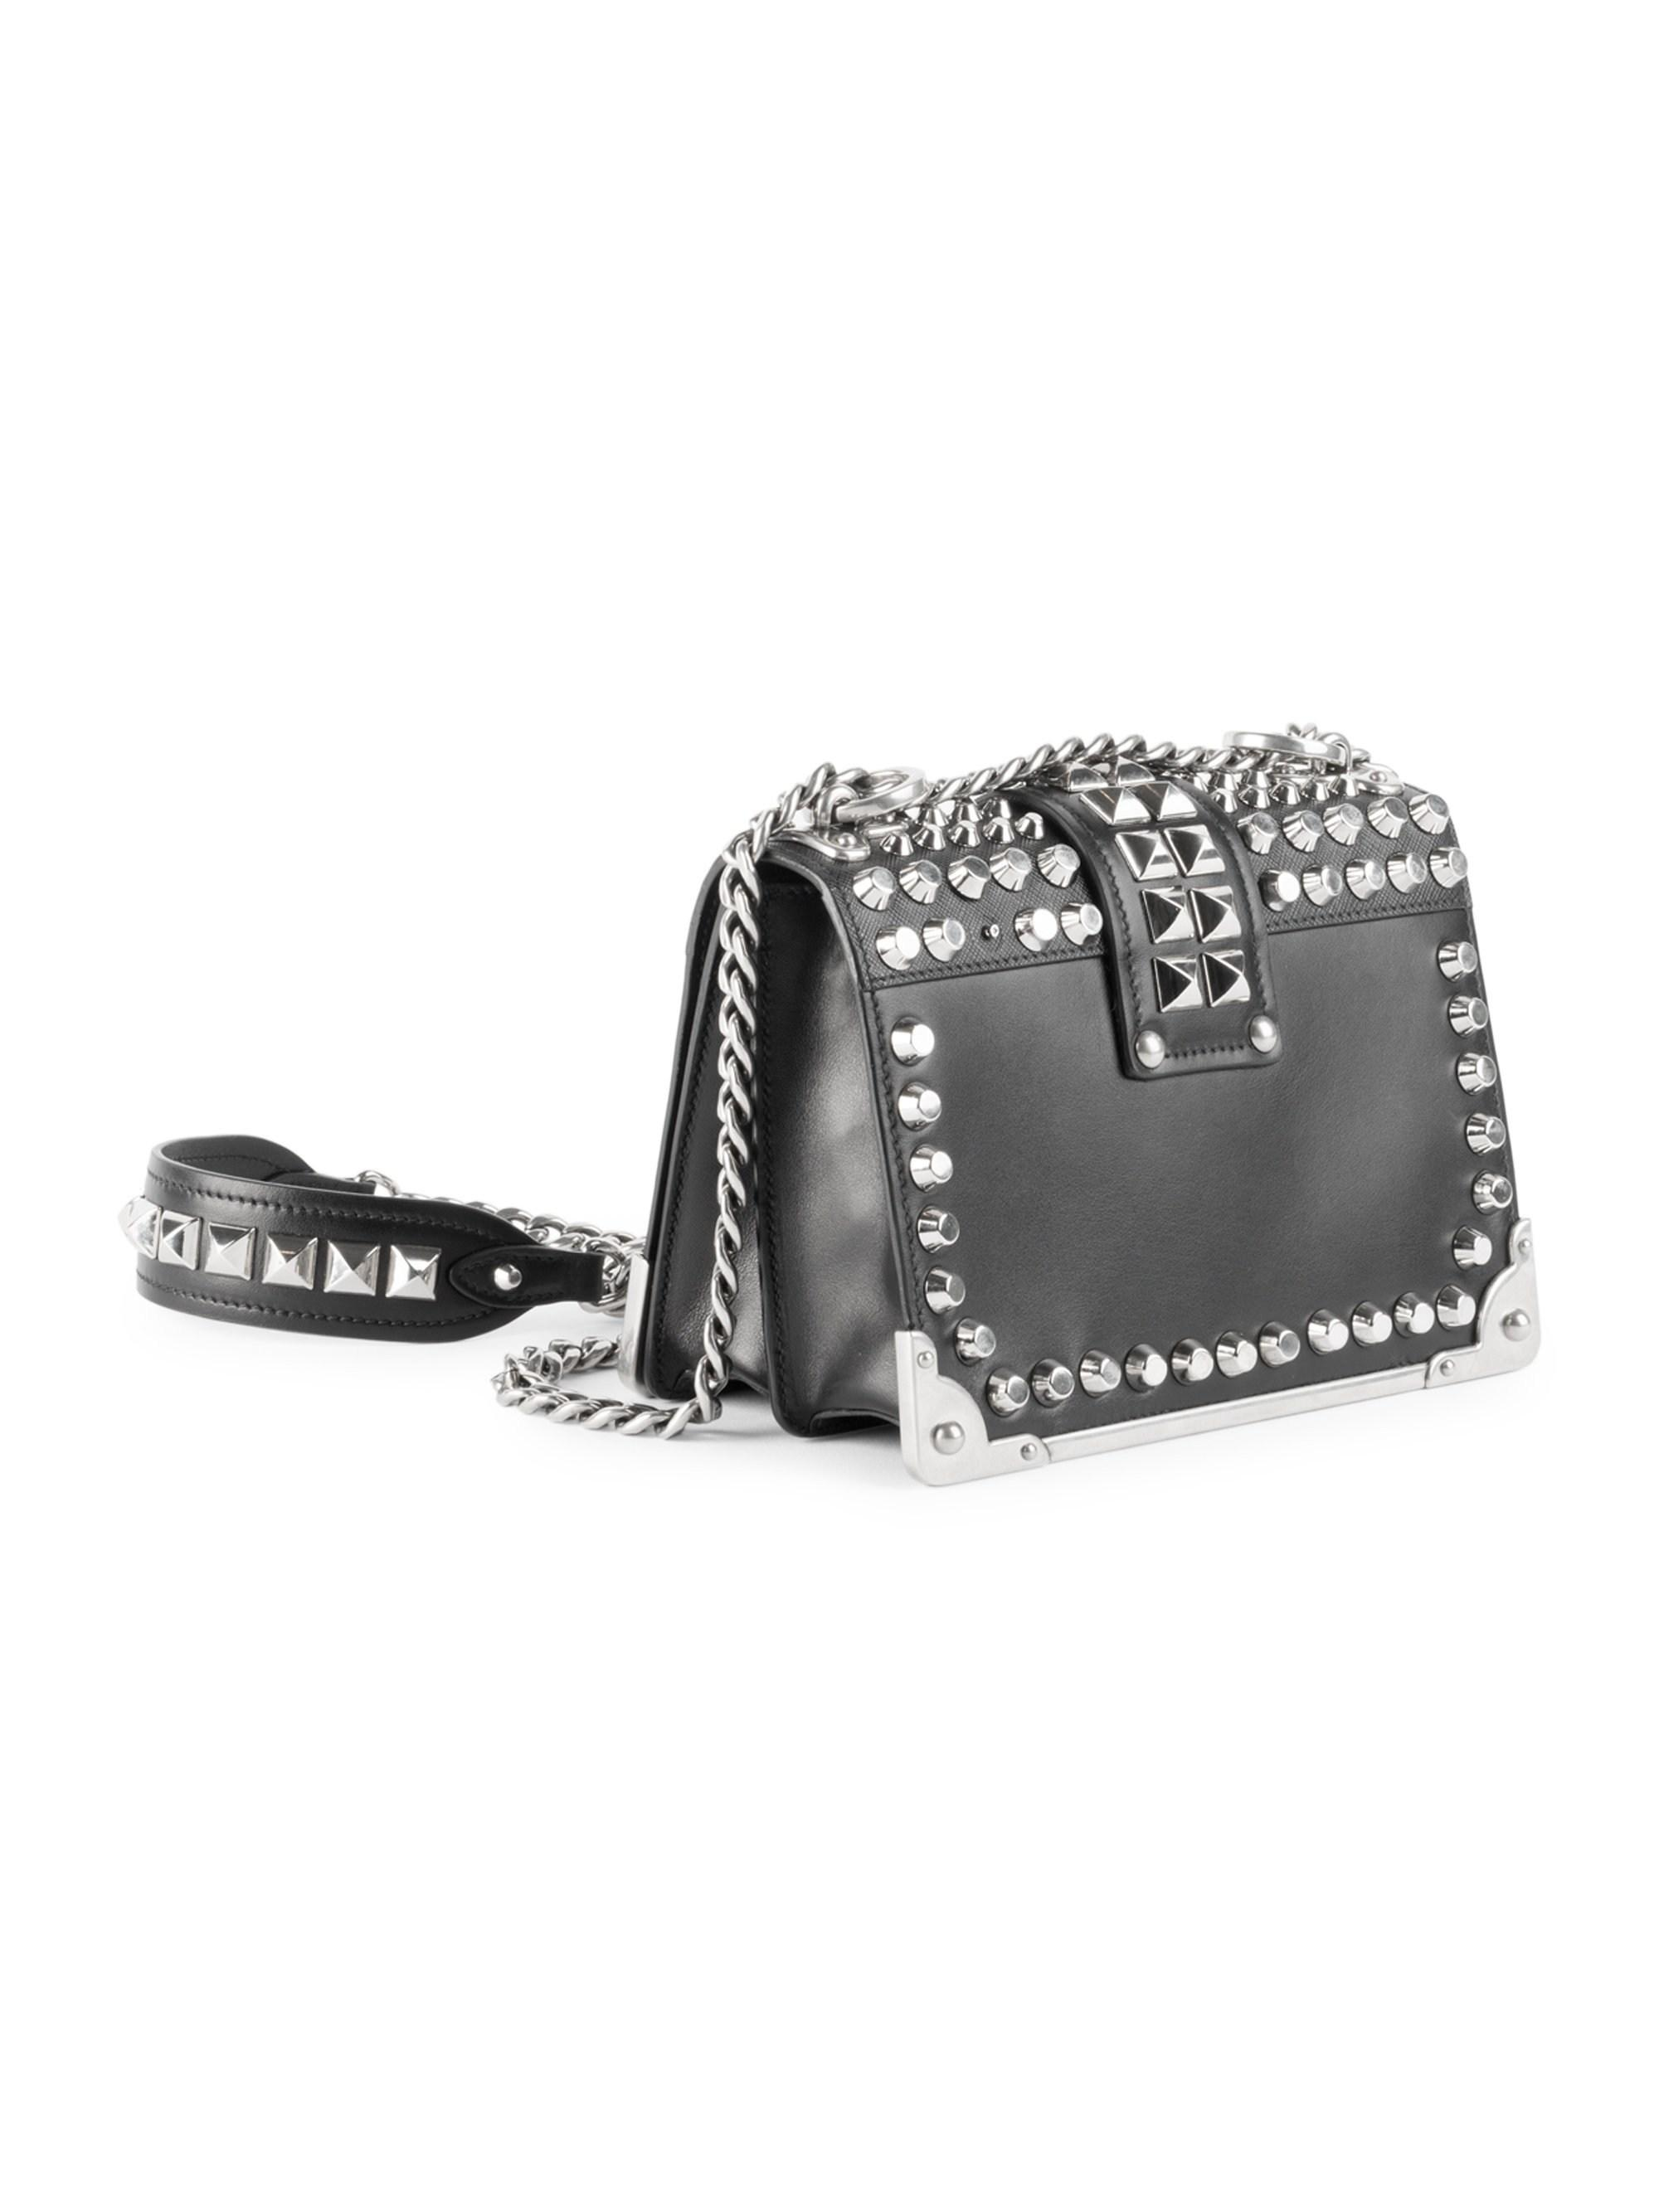 3a5ca295457a Prada - Women s Small Studded Cahier Leather Crossbody Bag - Black - Lyst.  View fullscreen